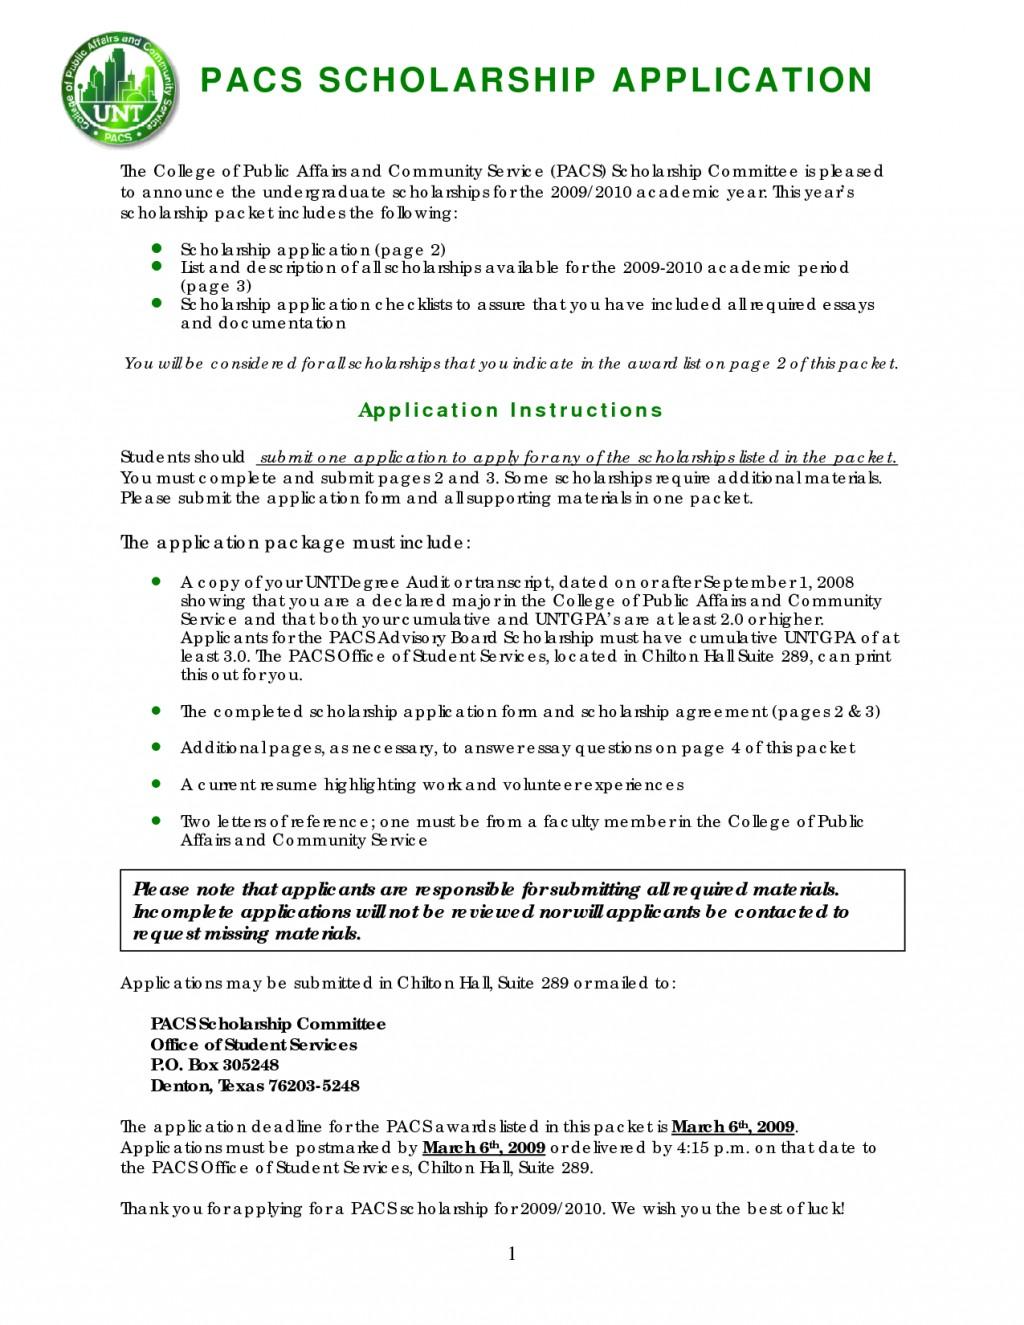 005 Short Essay Scholarships Zxsaqrl81t Amazing College Easy Large